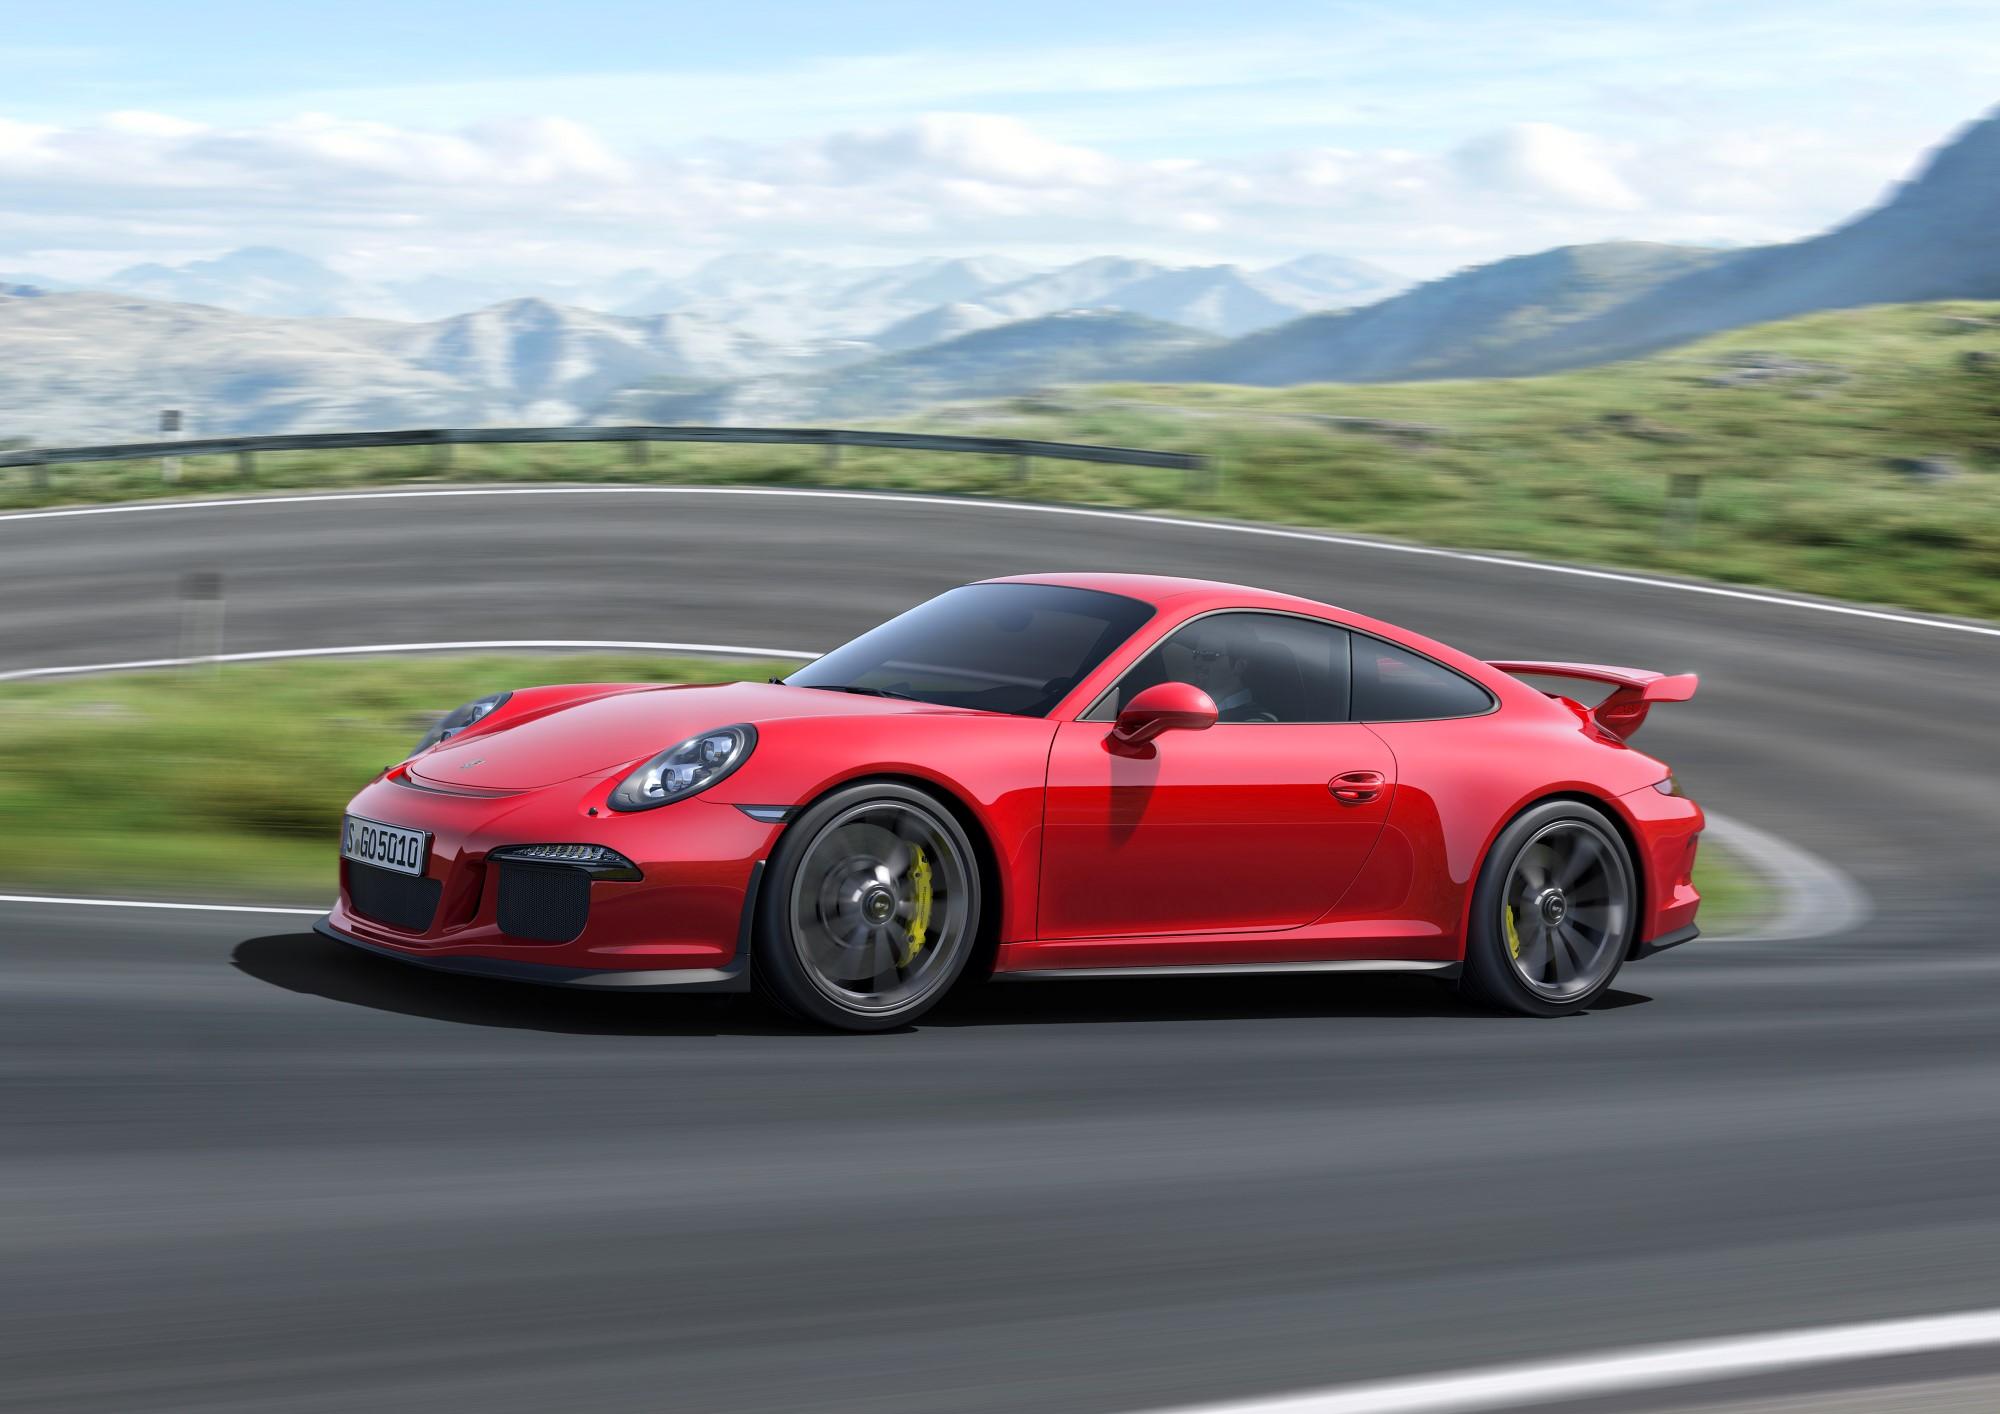 2014 porsche 911 gt3 unveiled at 2013 geneva auto show